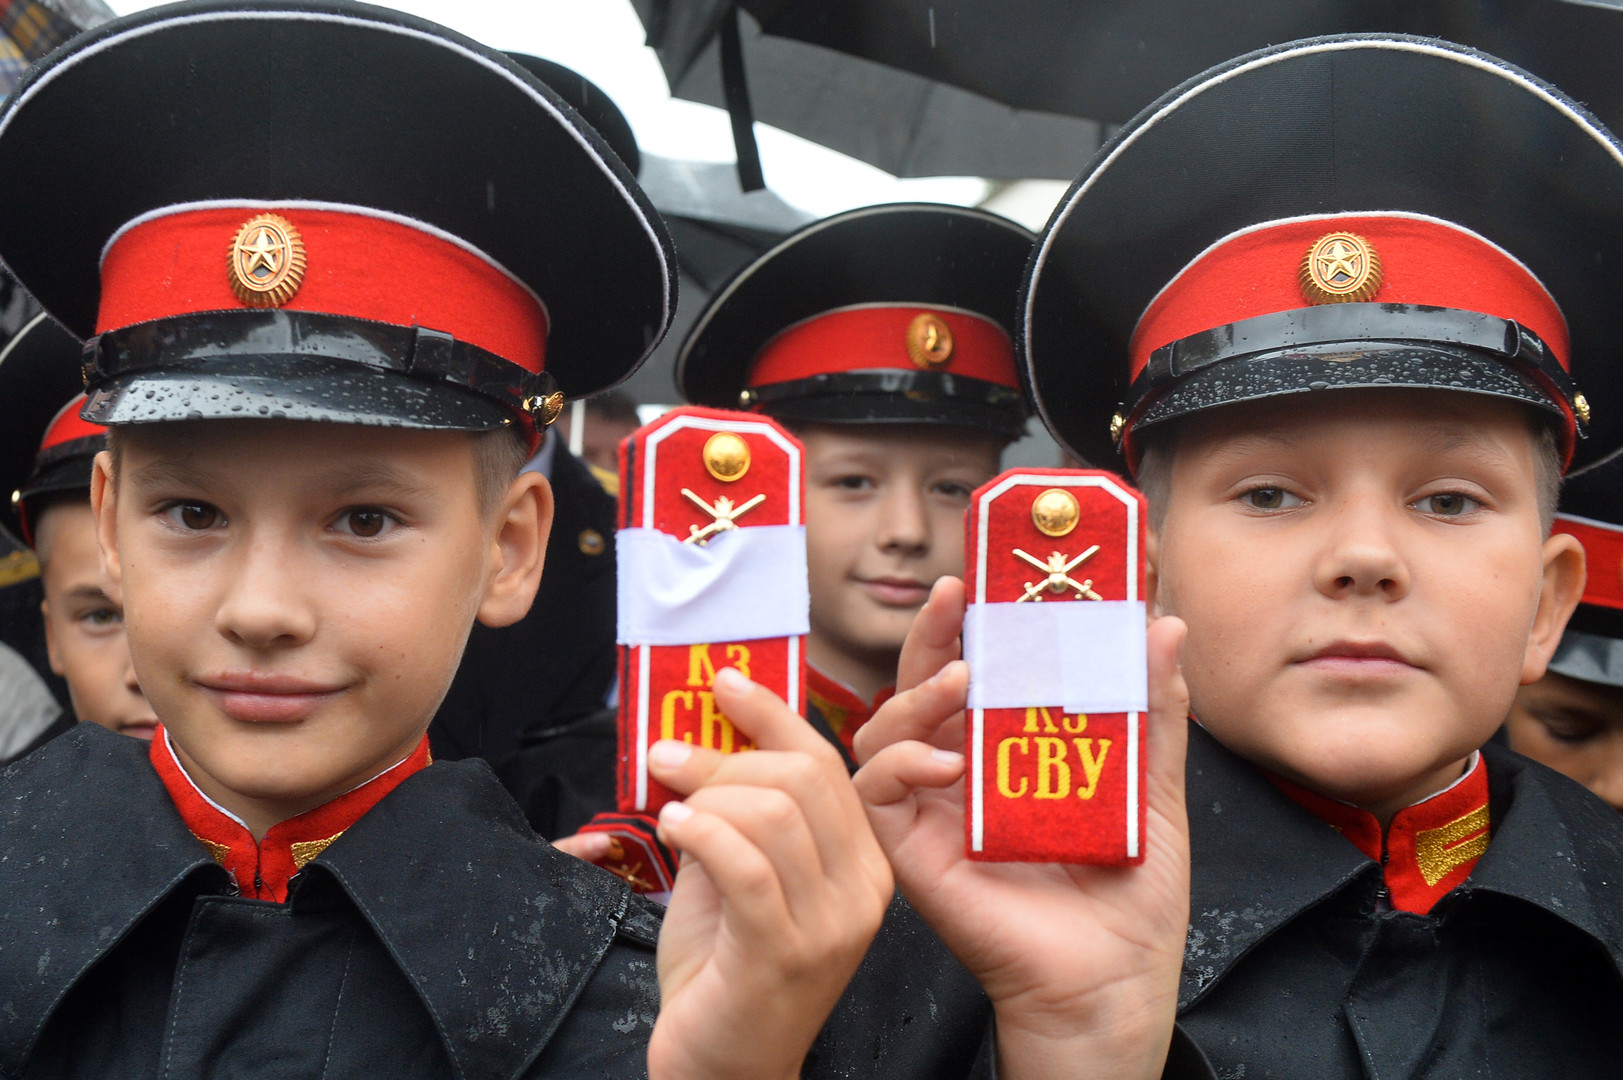 Zöglinge der Suworow-Militärschule in Kasan